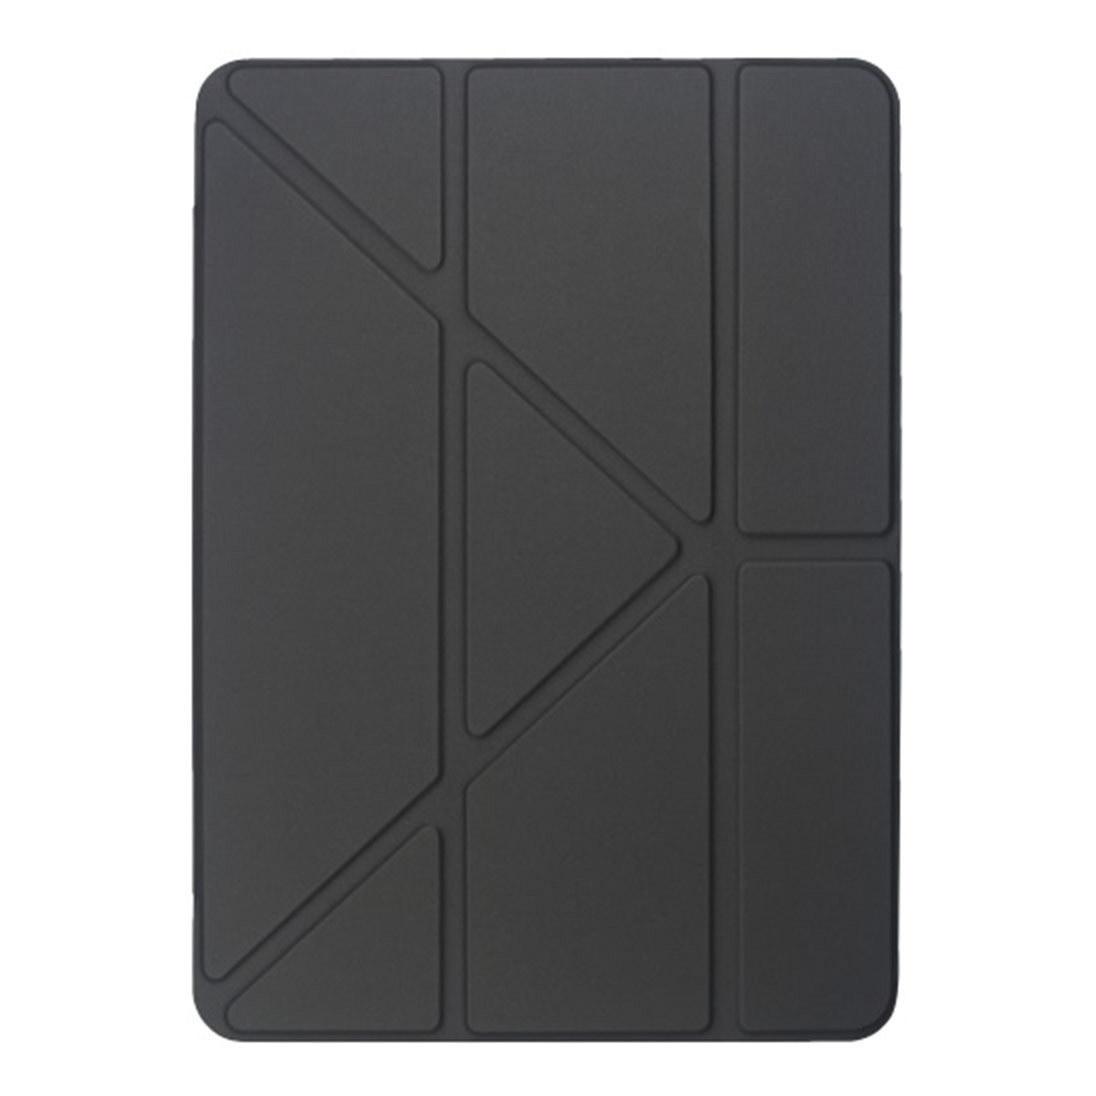 Чехол Red Line Soft-touch для планшета Apple iPad 12.9 (2020), черный фото